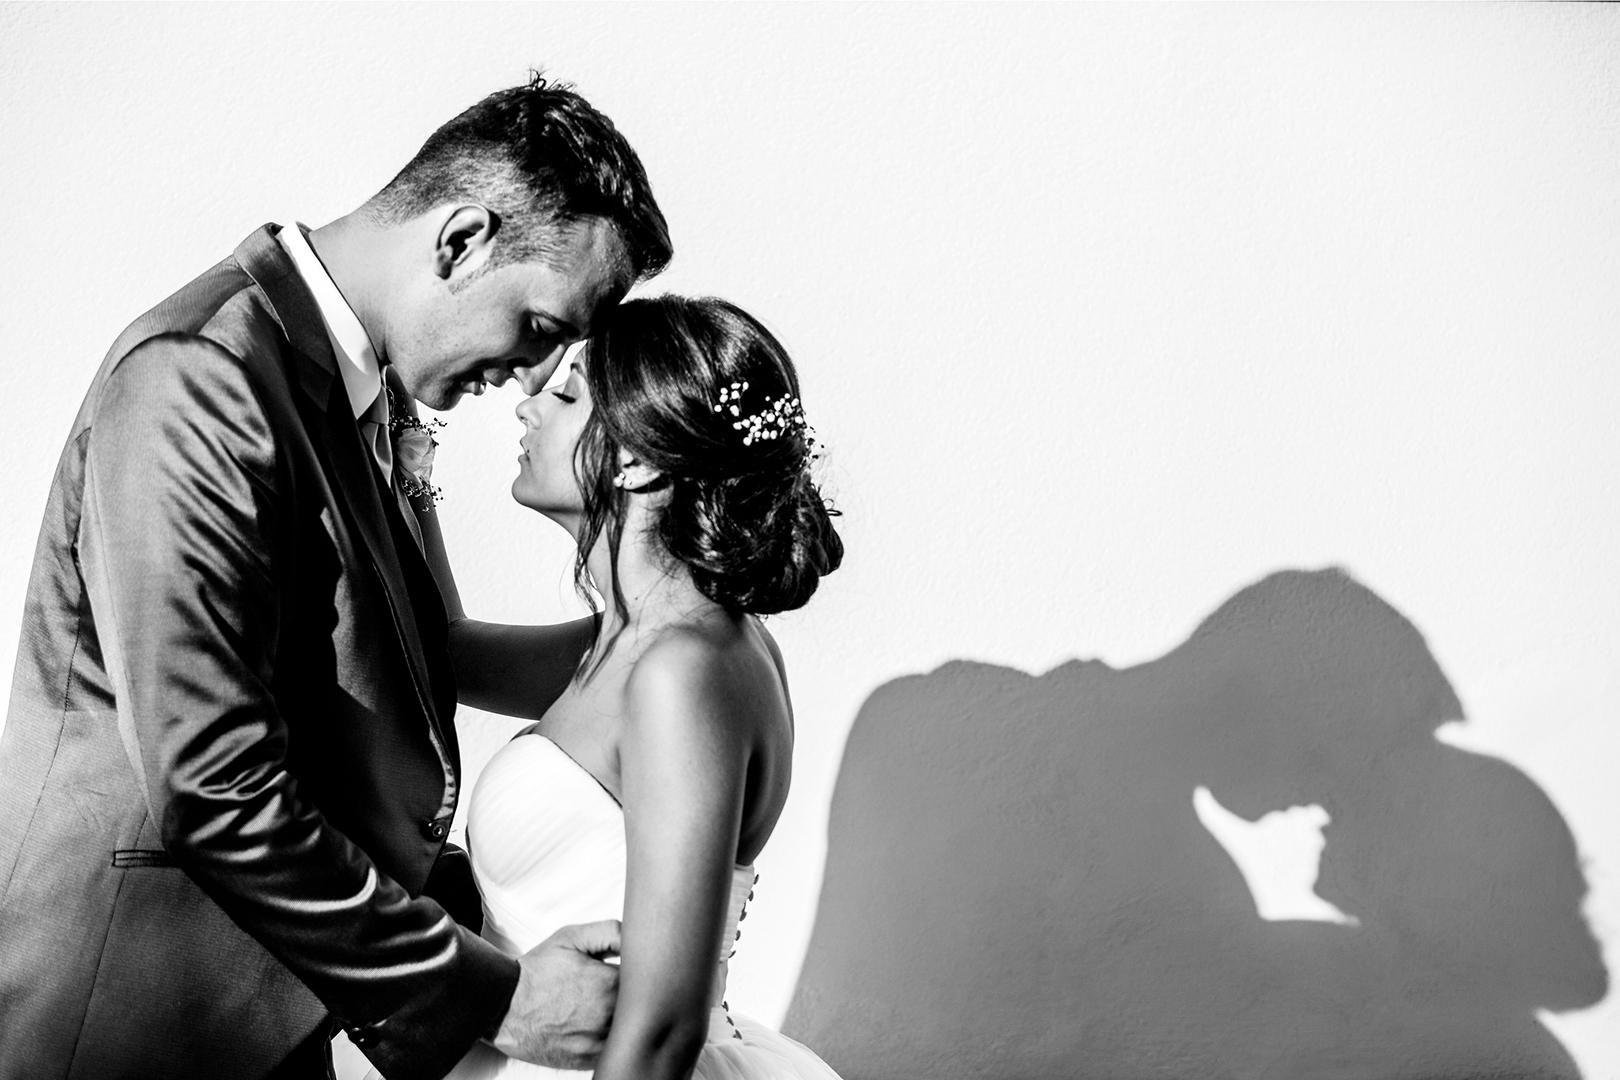 60 gianni-lepore-sposi-esterni torre-andriana-foggia-fotografo-wedding-bride-groom-foto-